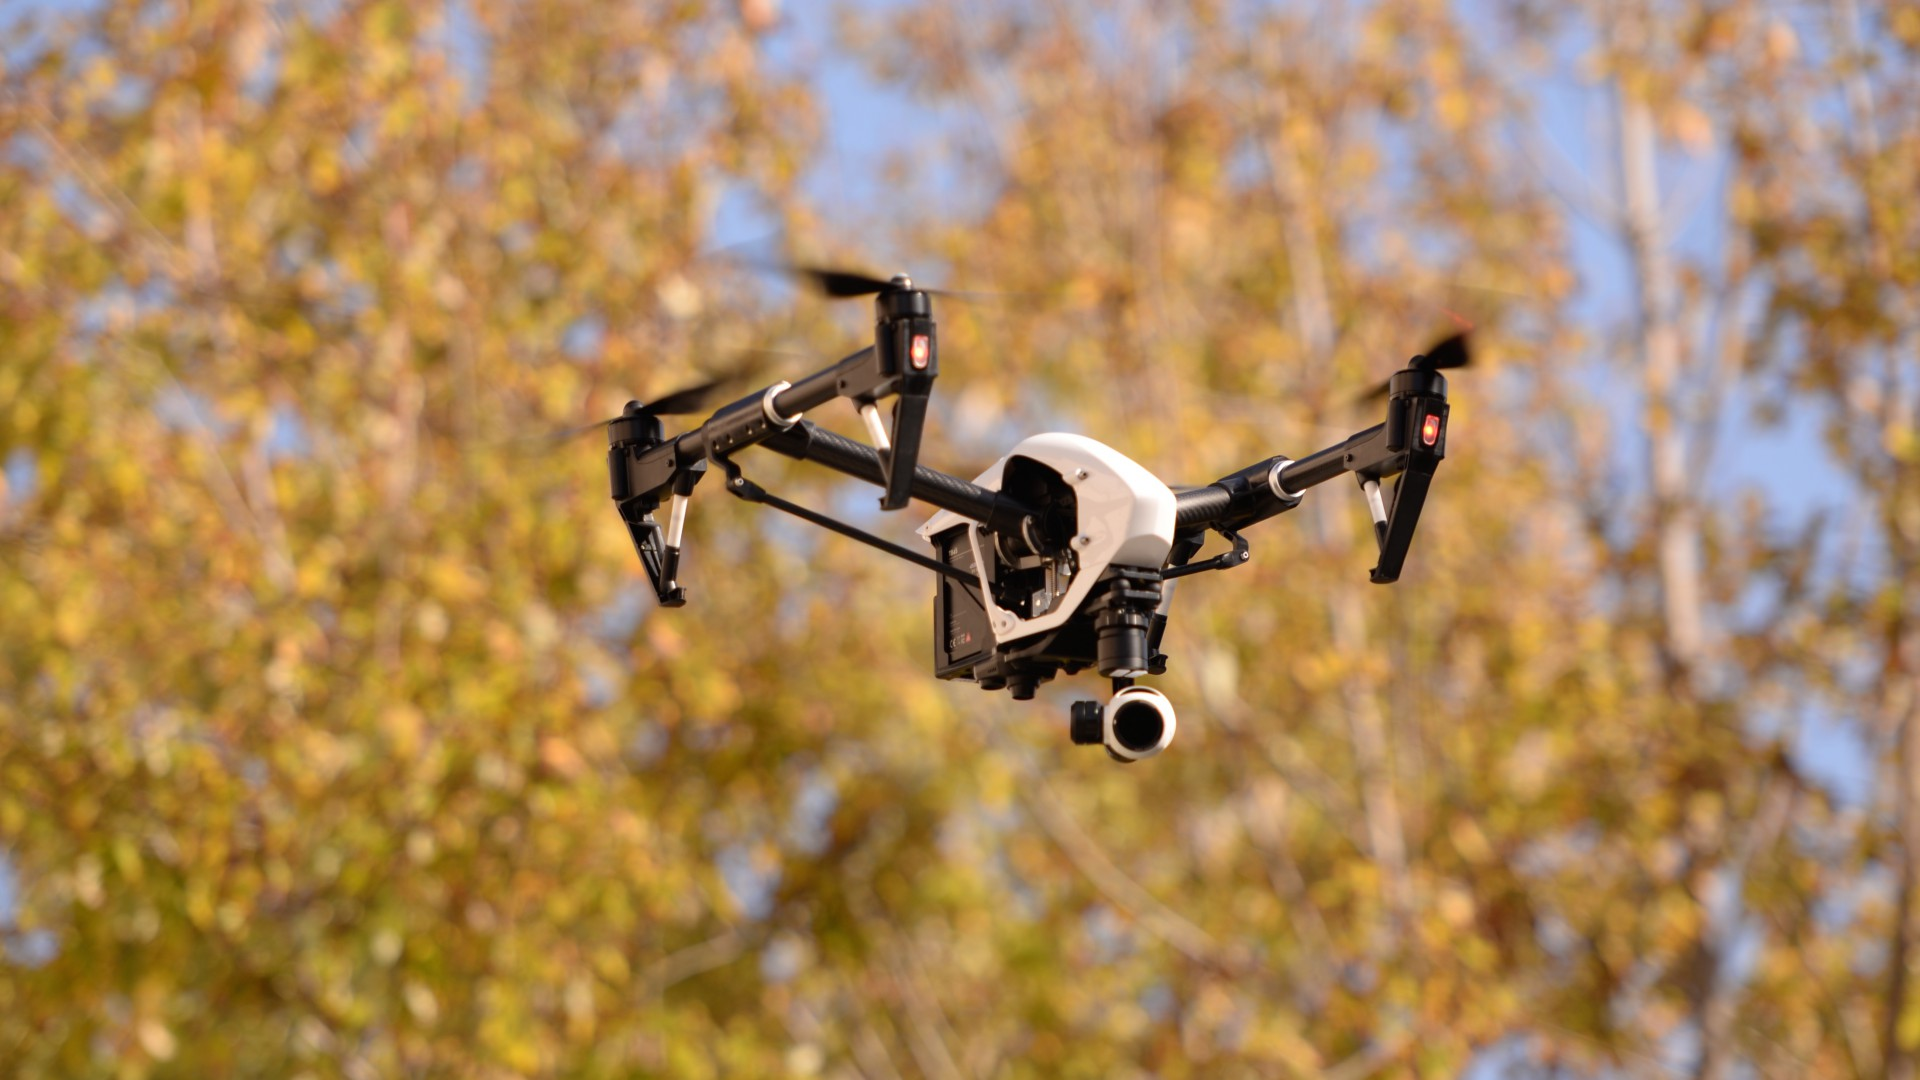 Best Dji Drone >> Wallpaper DJI Inspire One, drone, quadcopter, camera, Hi ...